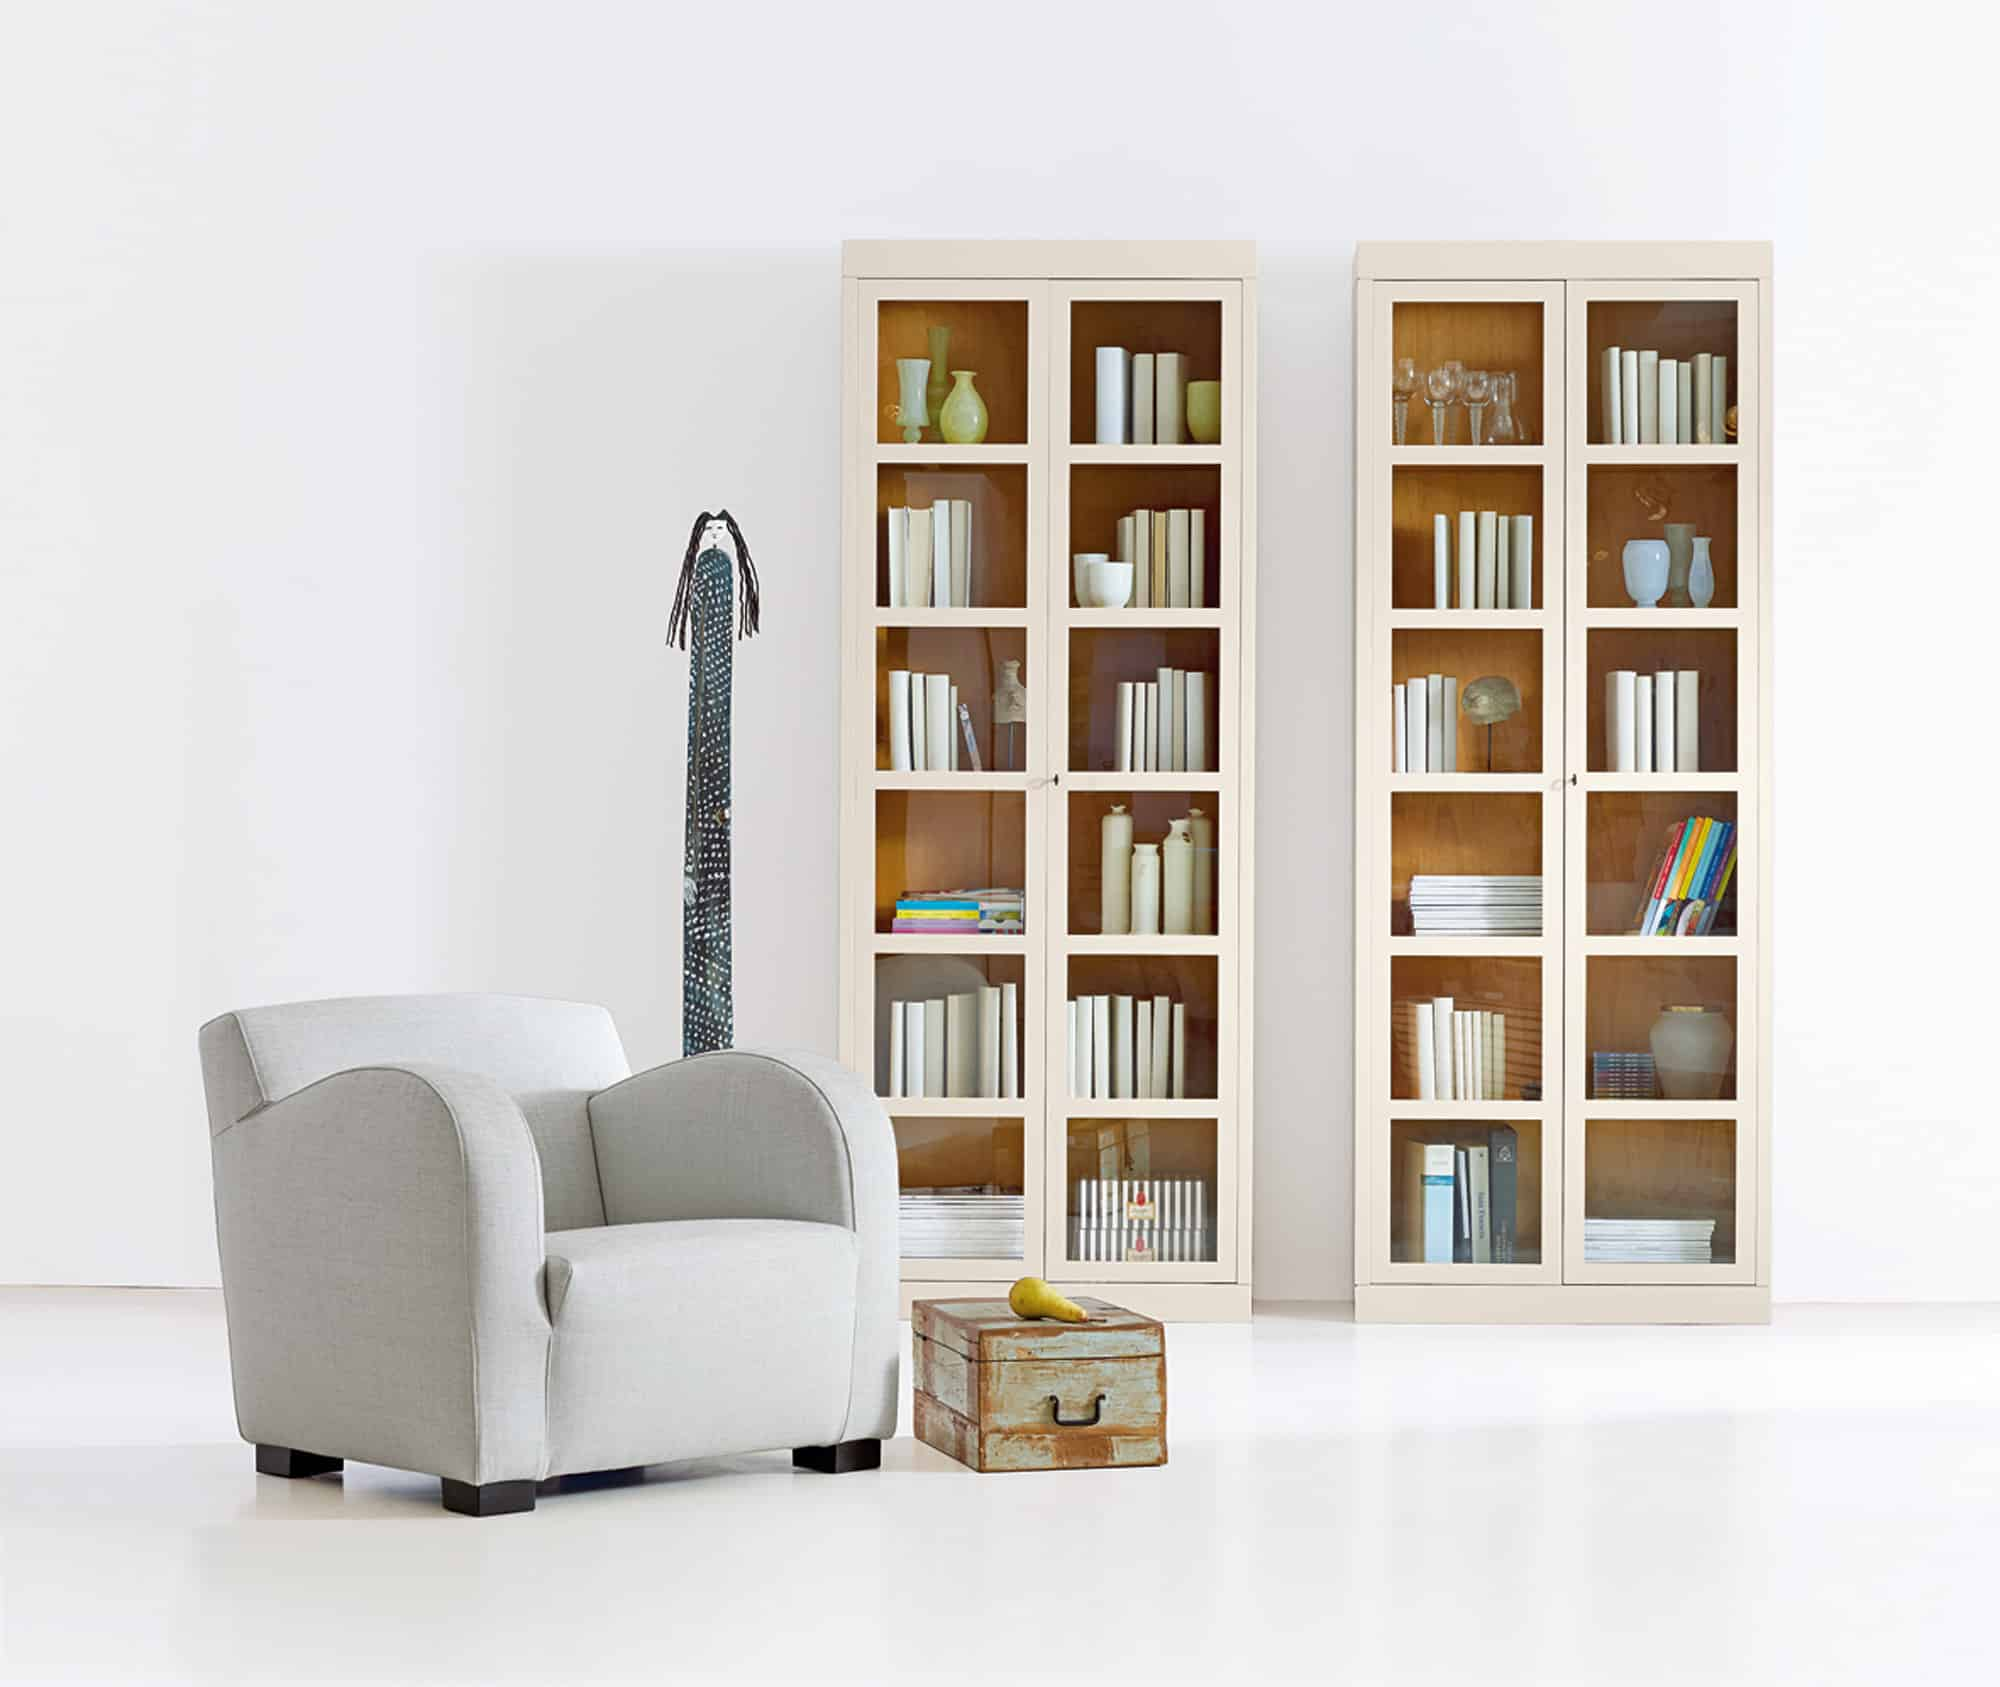 vitrinen regale schr nke marktex. Black Bedroom Furniture Sets. Home Design Ideas